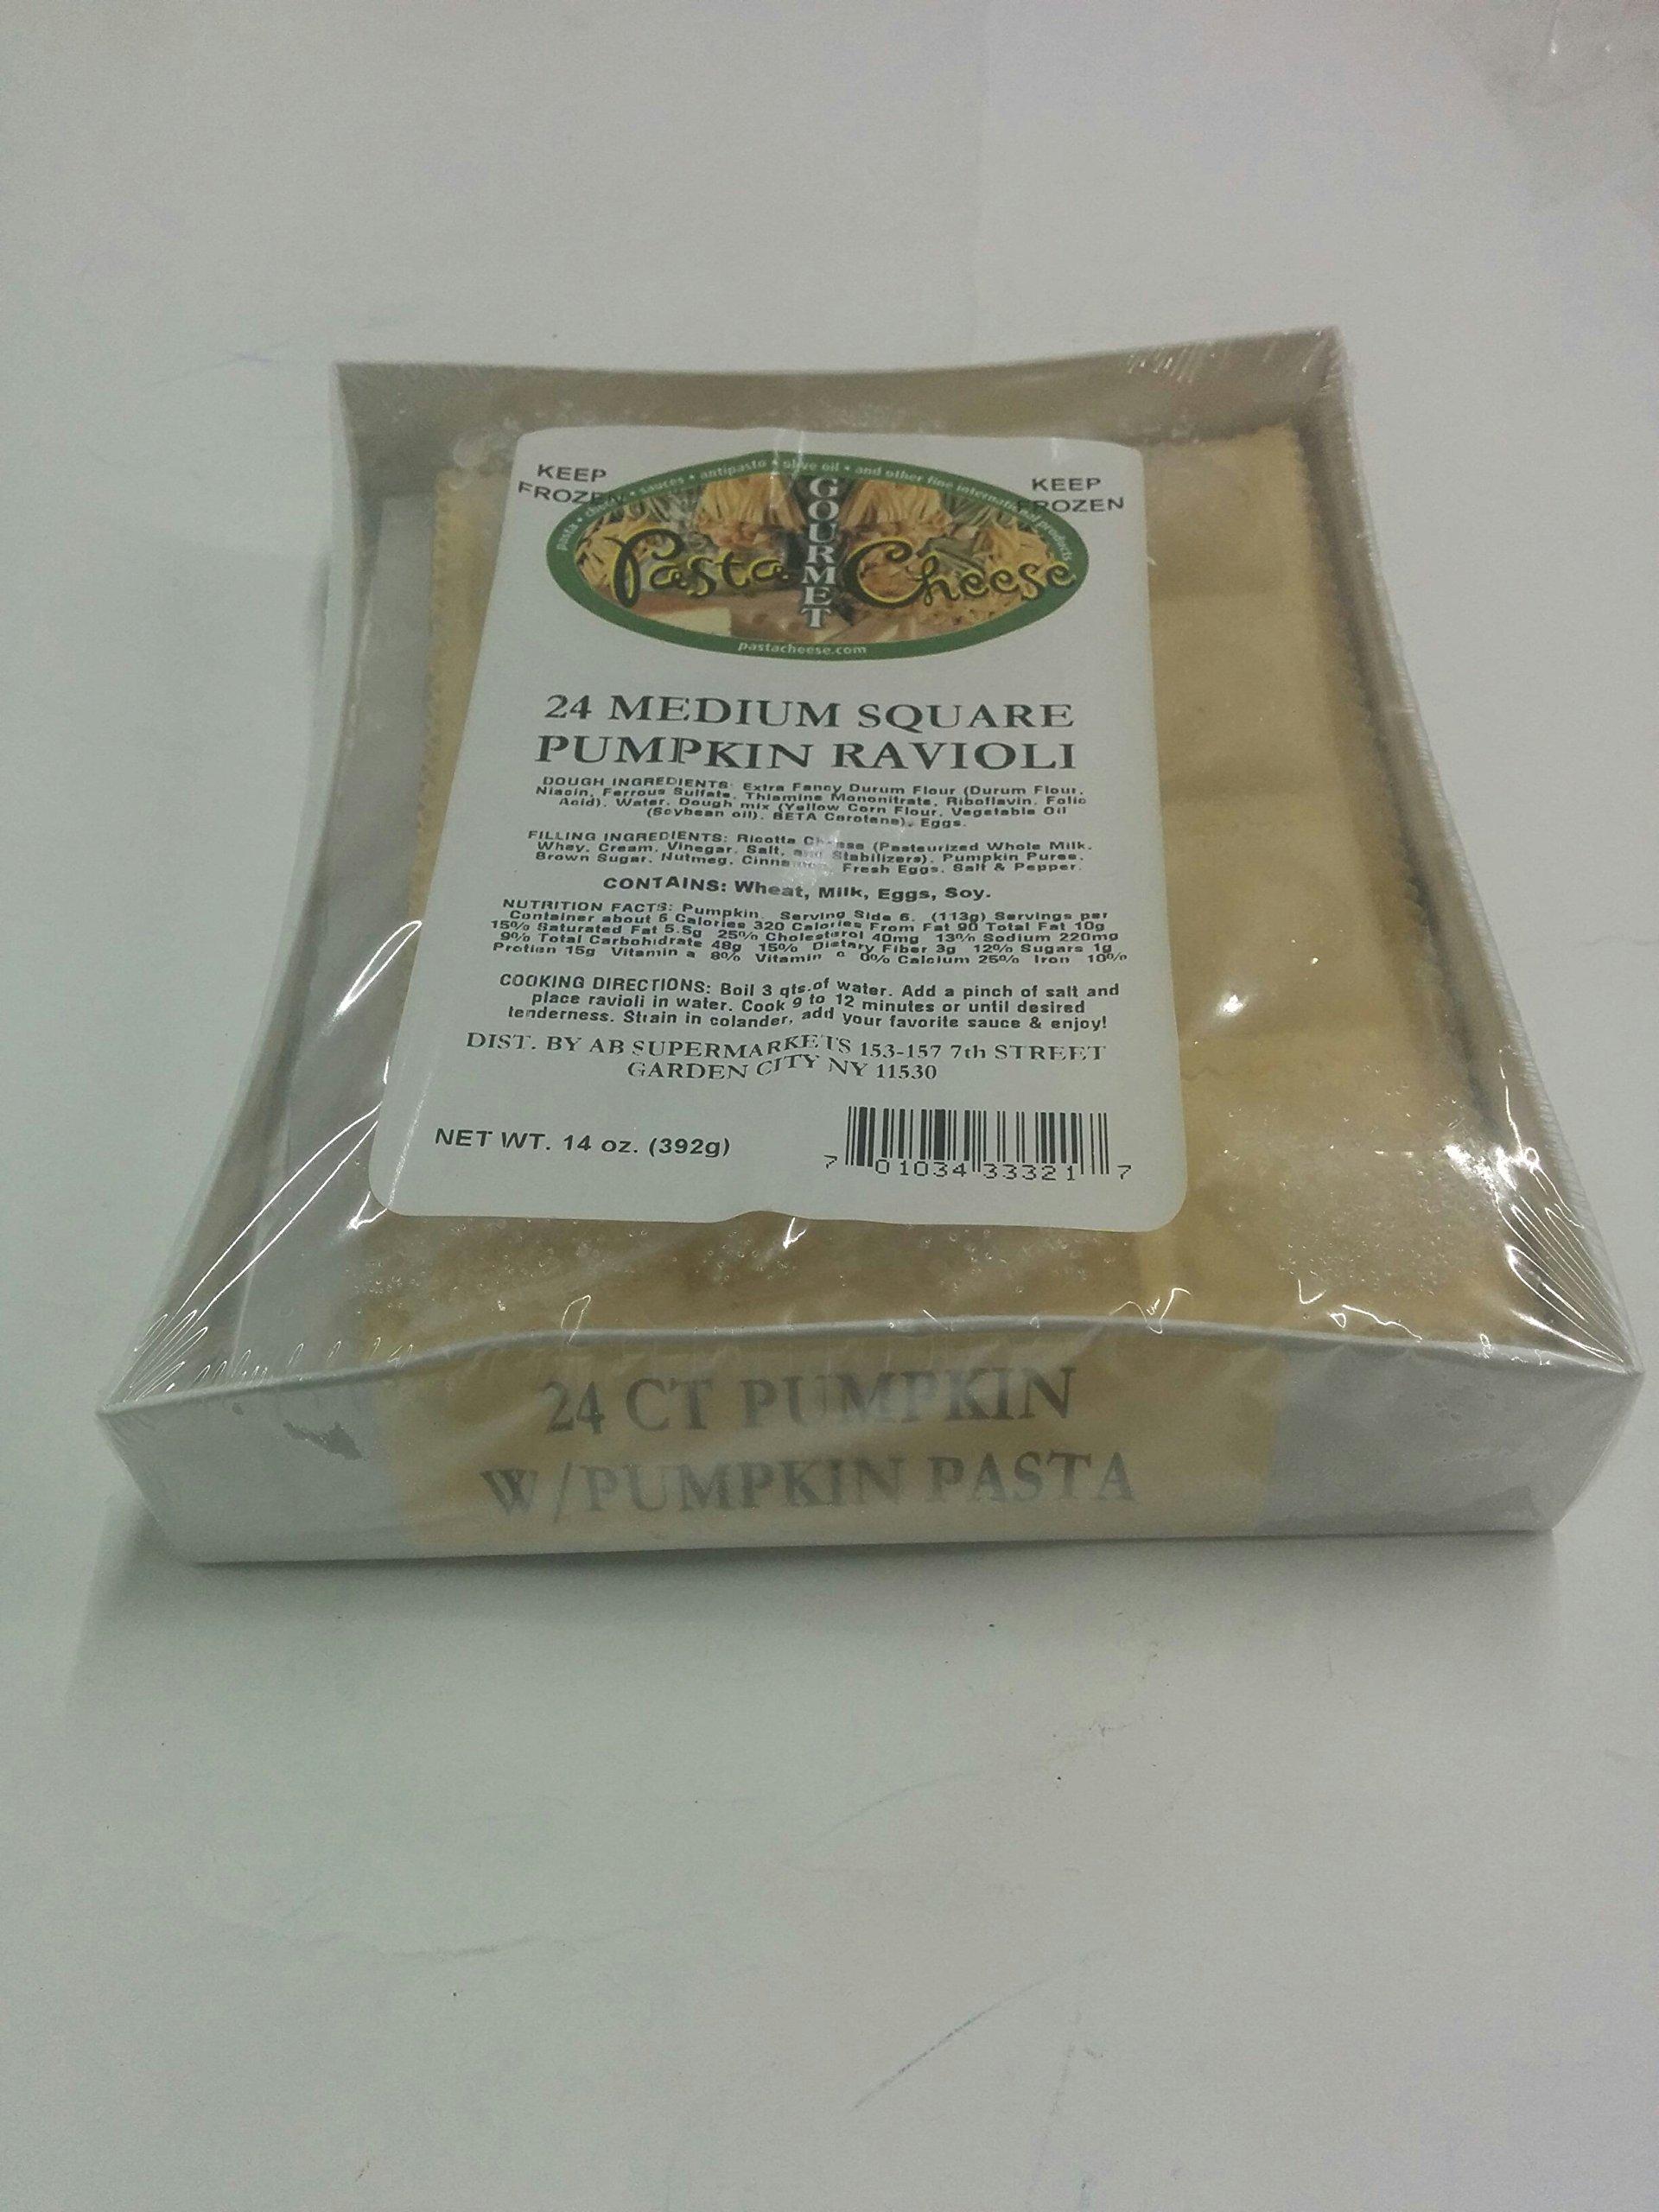 PastaCheese Fresh Medium Square Pumpkin Ravioli, 14 Ounce (Pack of 4)